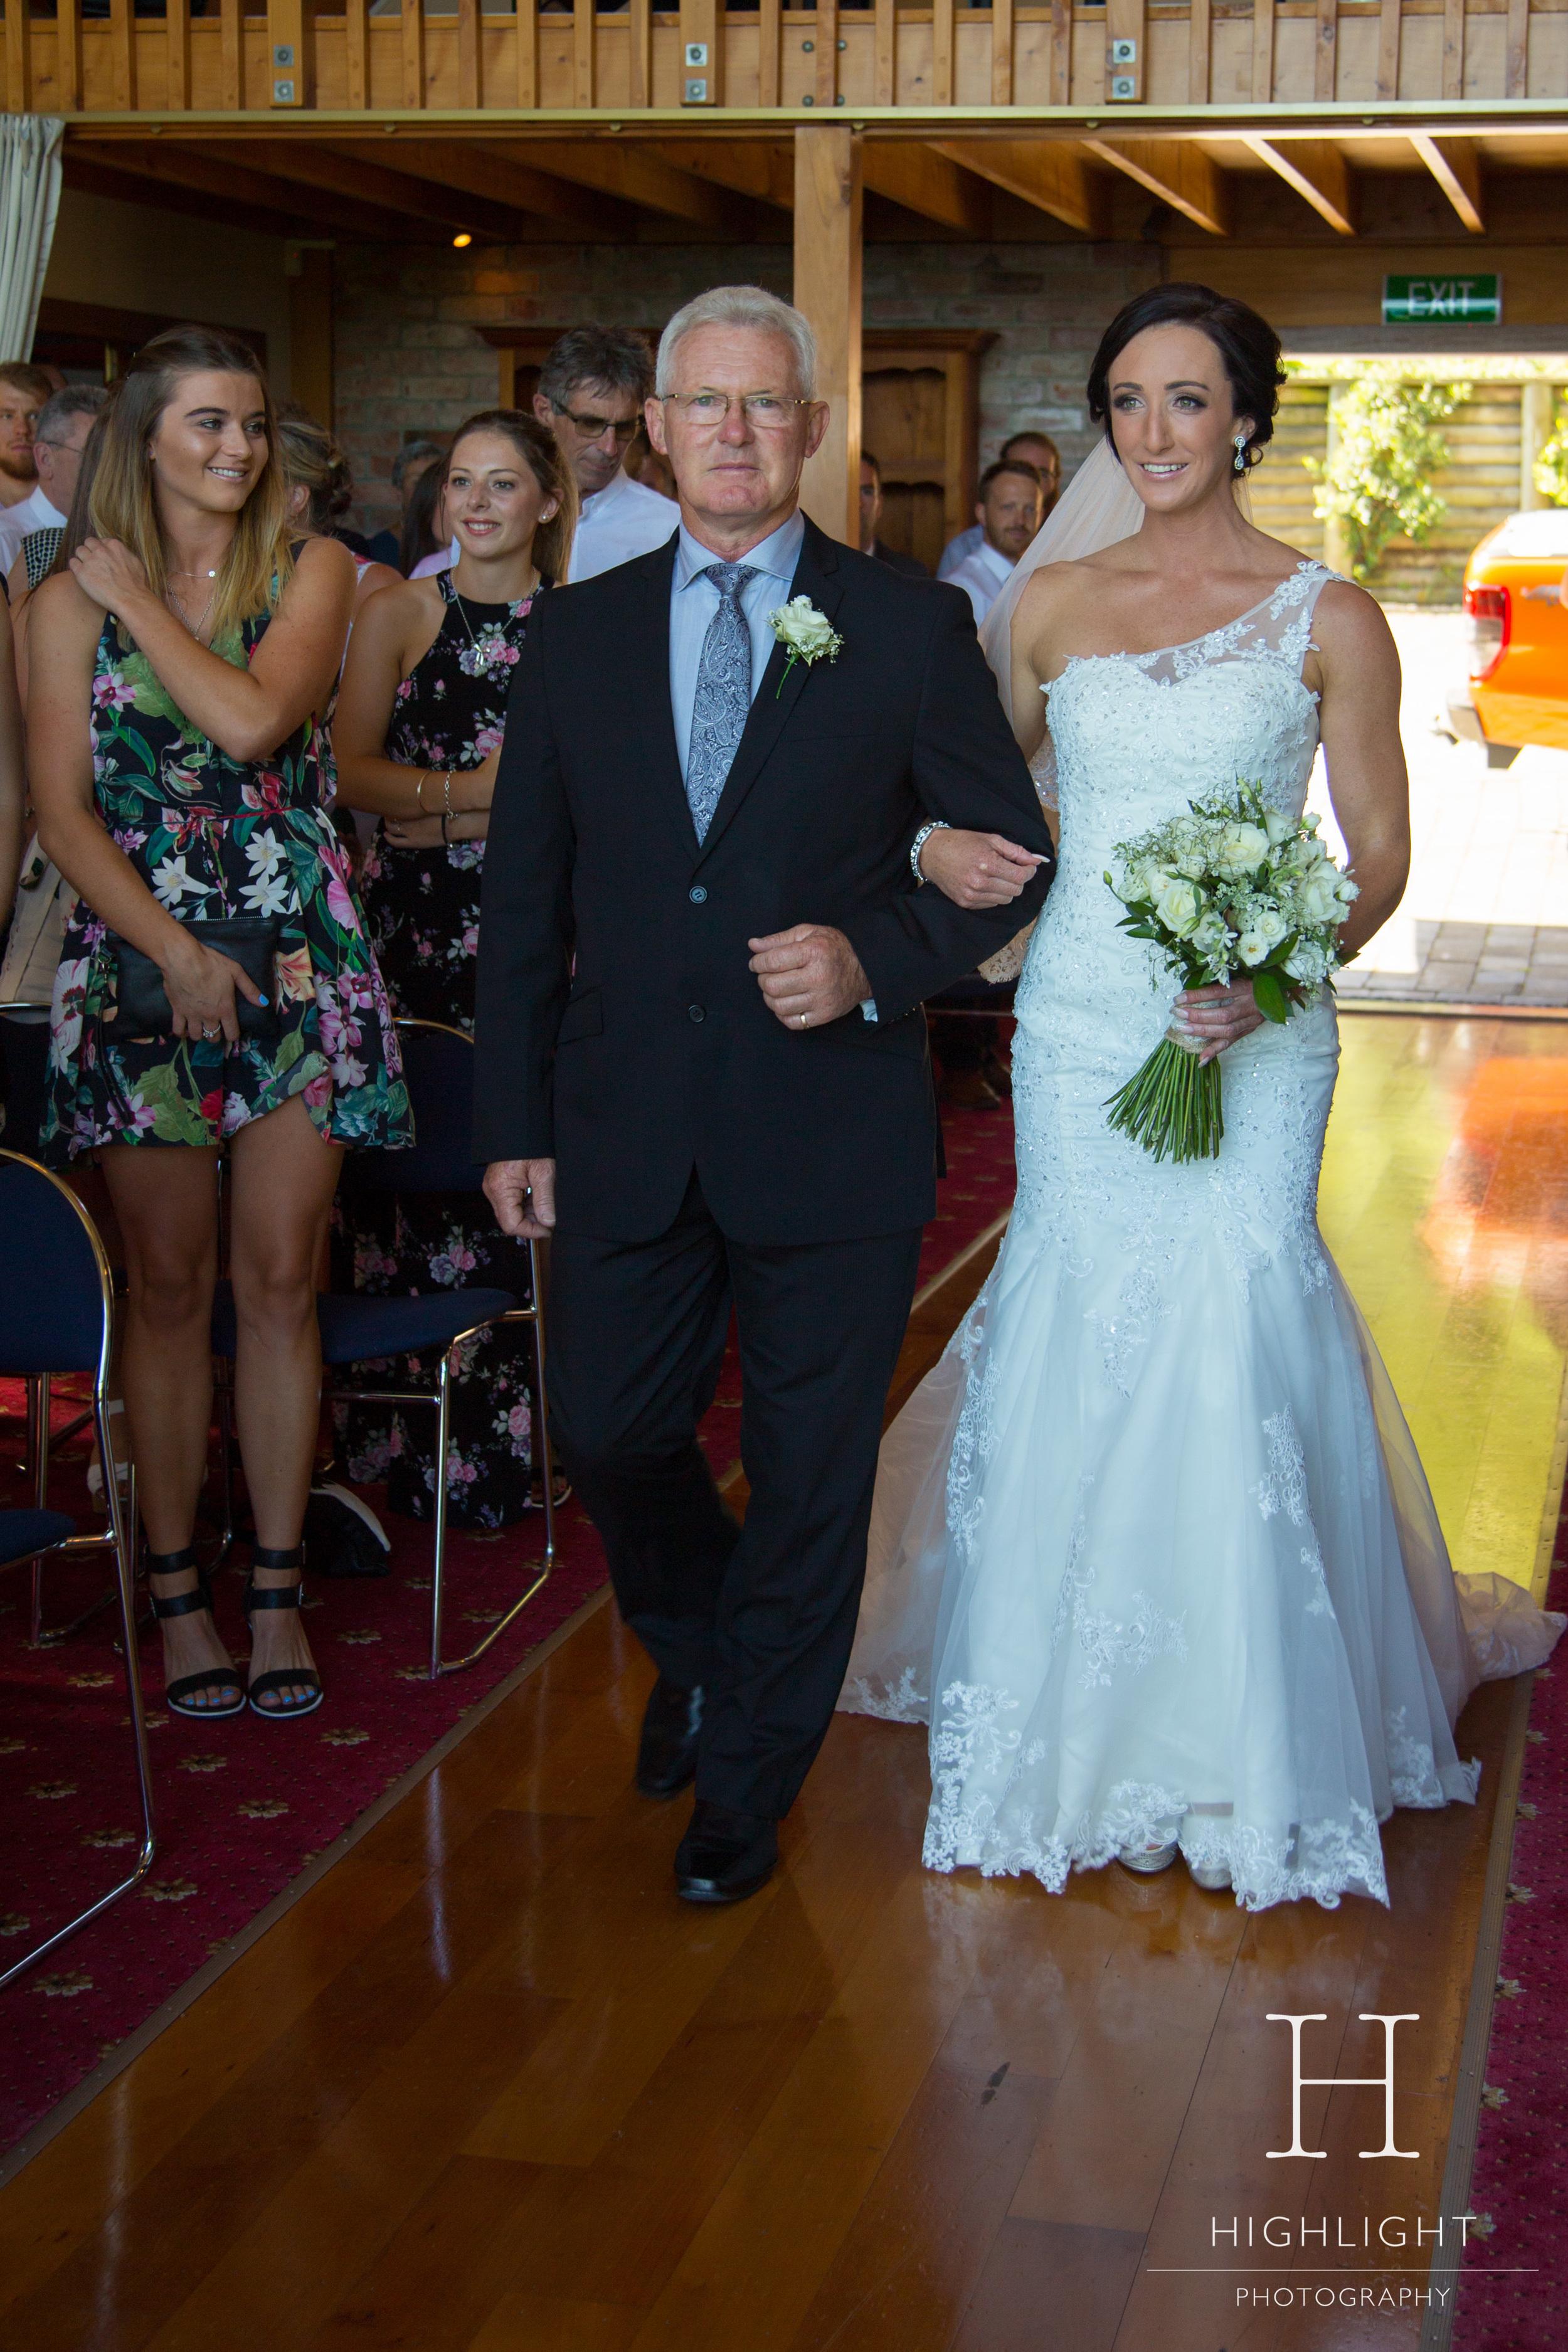 highlight_photography_wedding_new_zealand_aisle.jpg